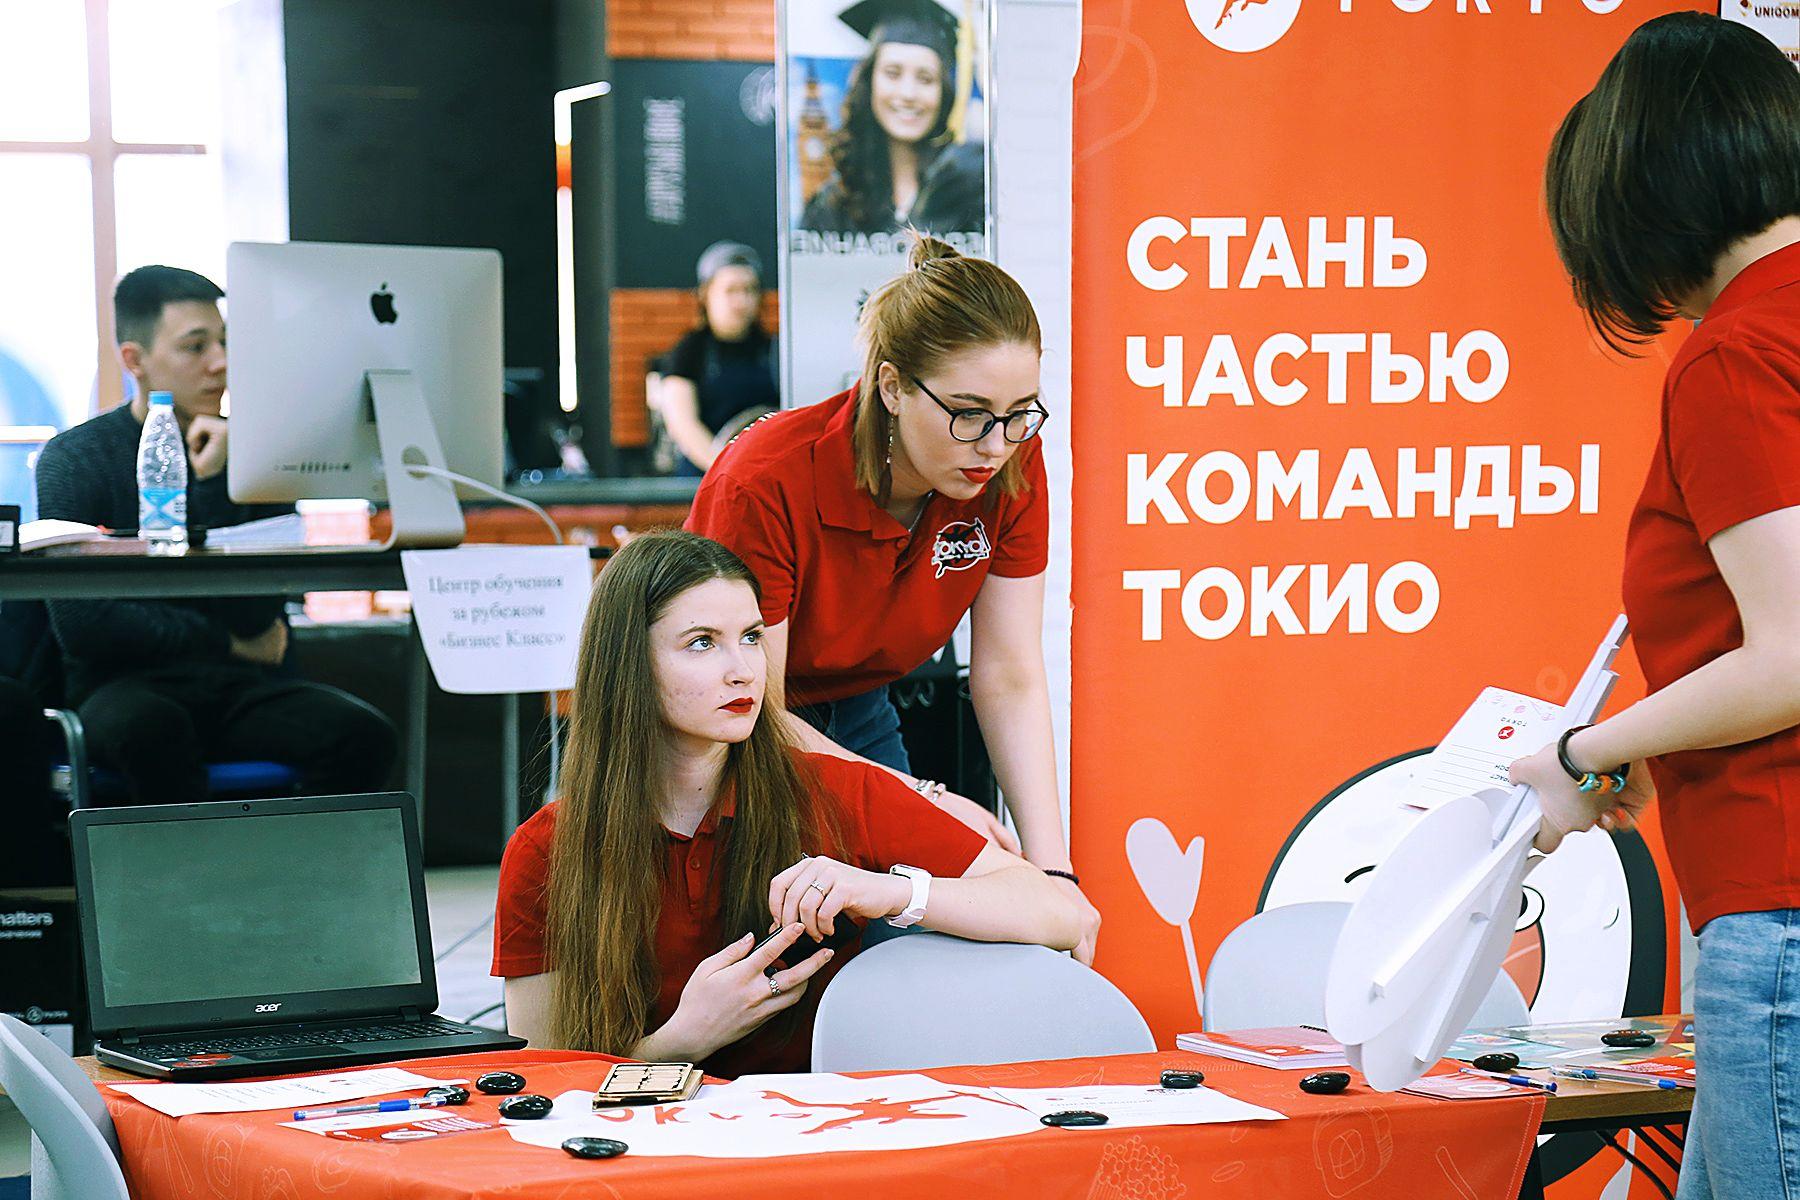 Цифровое трудоустройство во ВГУЭС: сотни вакансий, стажировка и практика